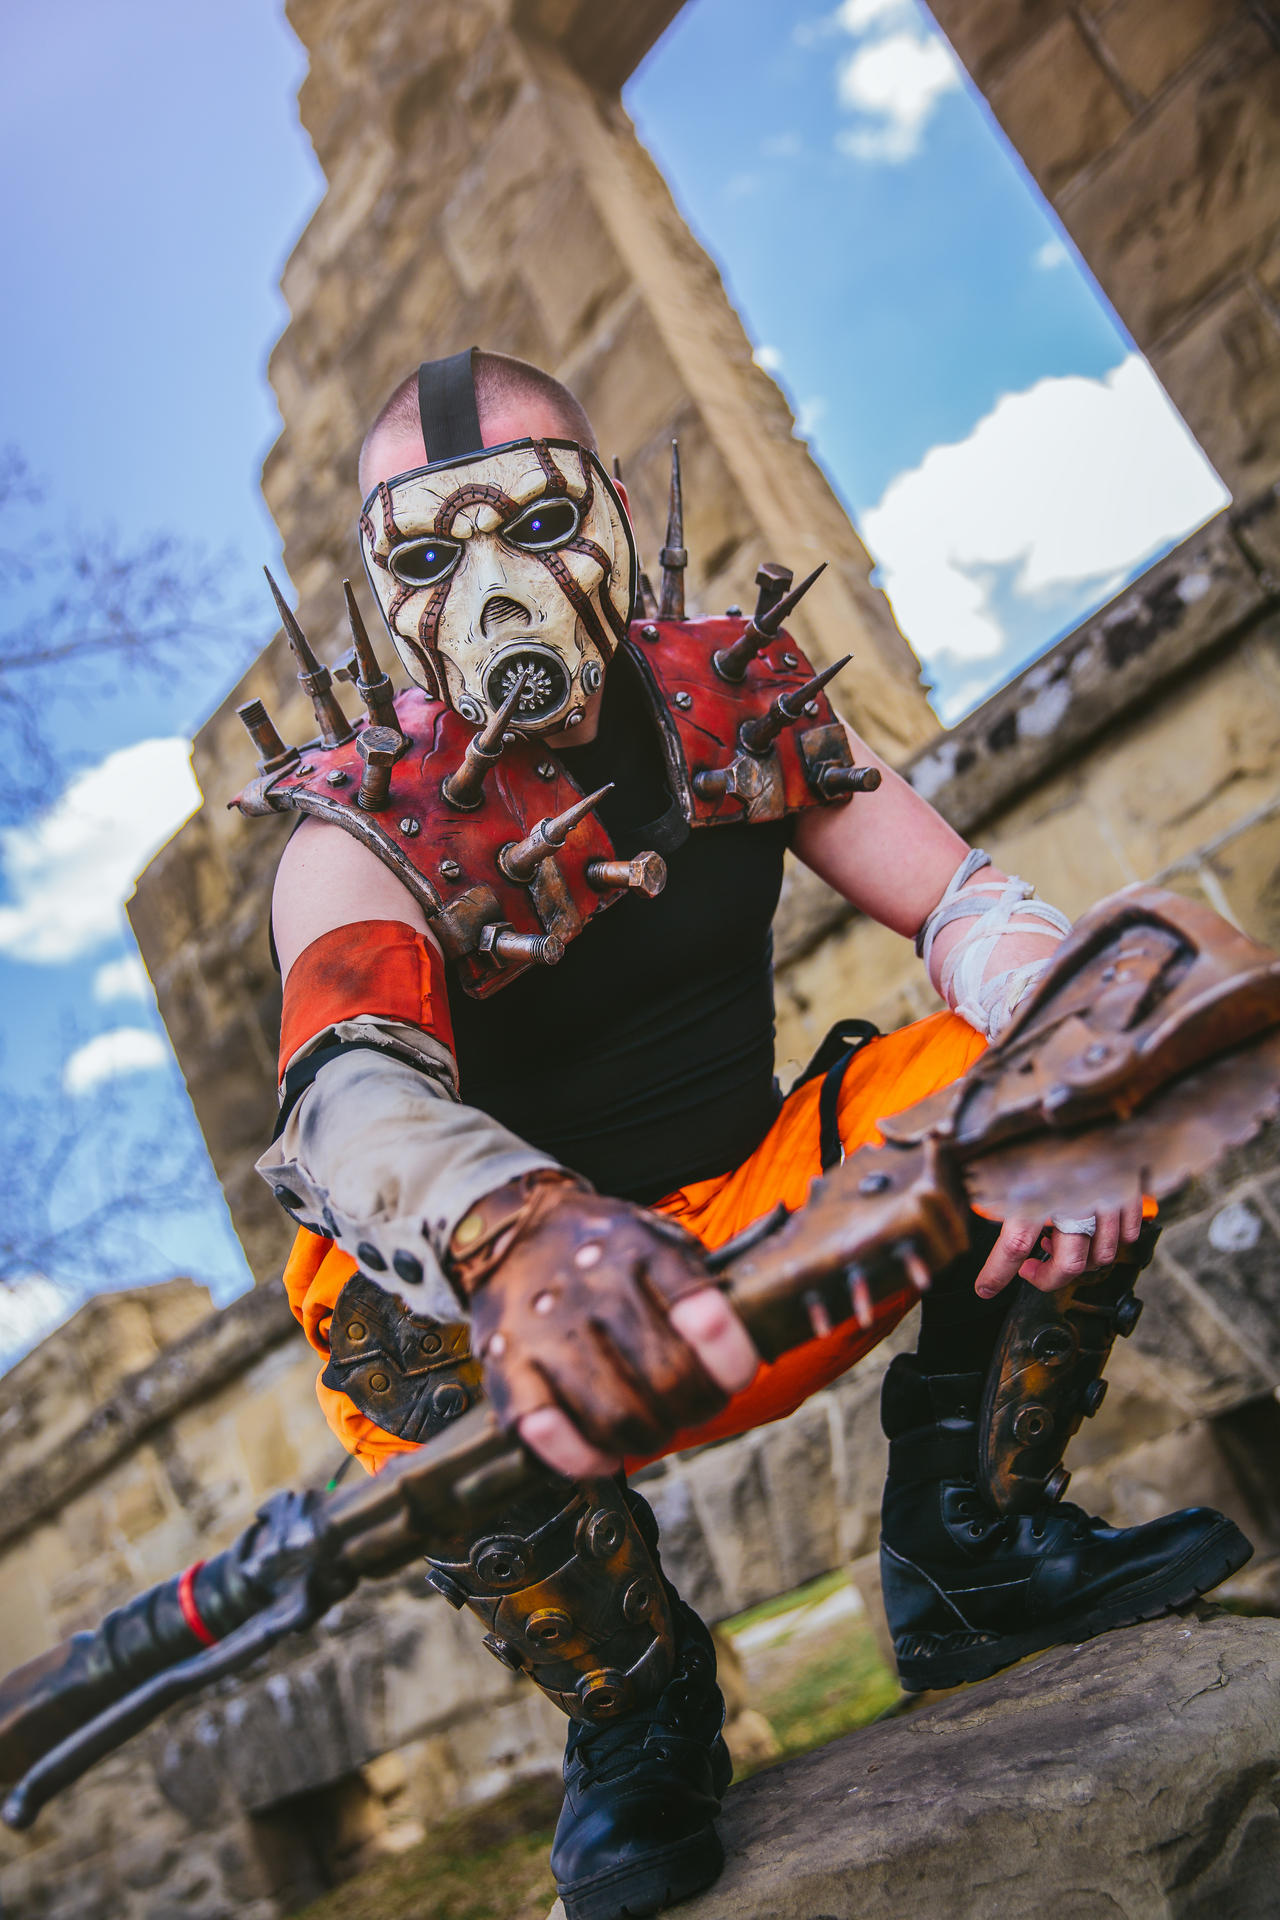 Borderlands Psycho Cosplay SKS Props Calgary Expo